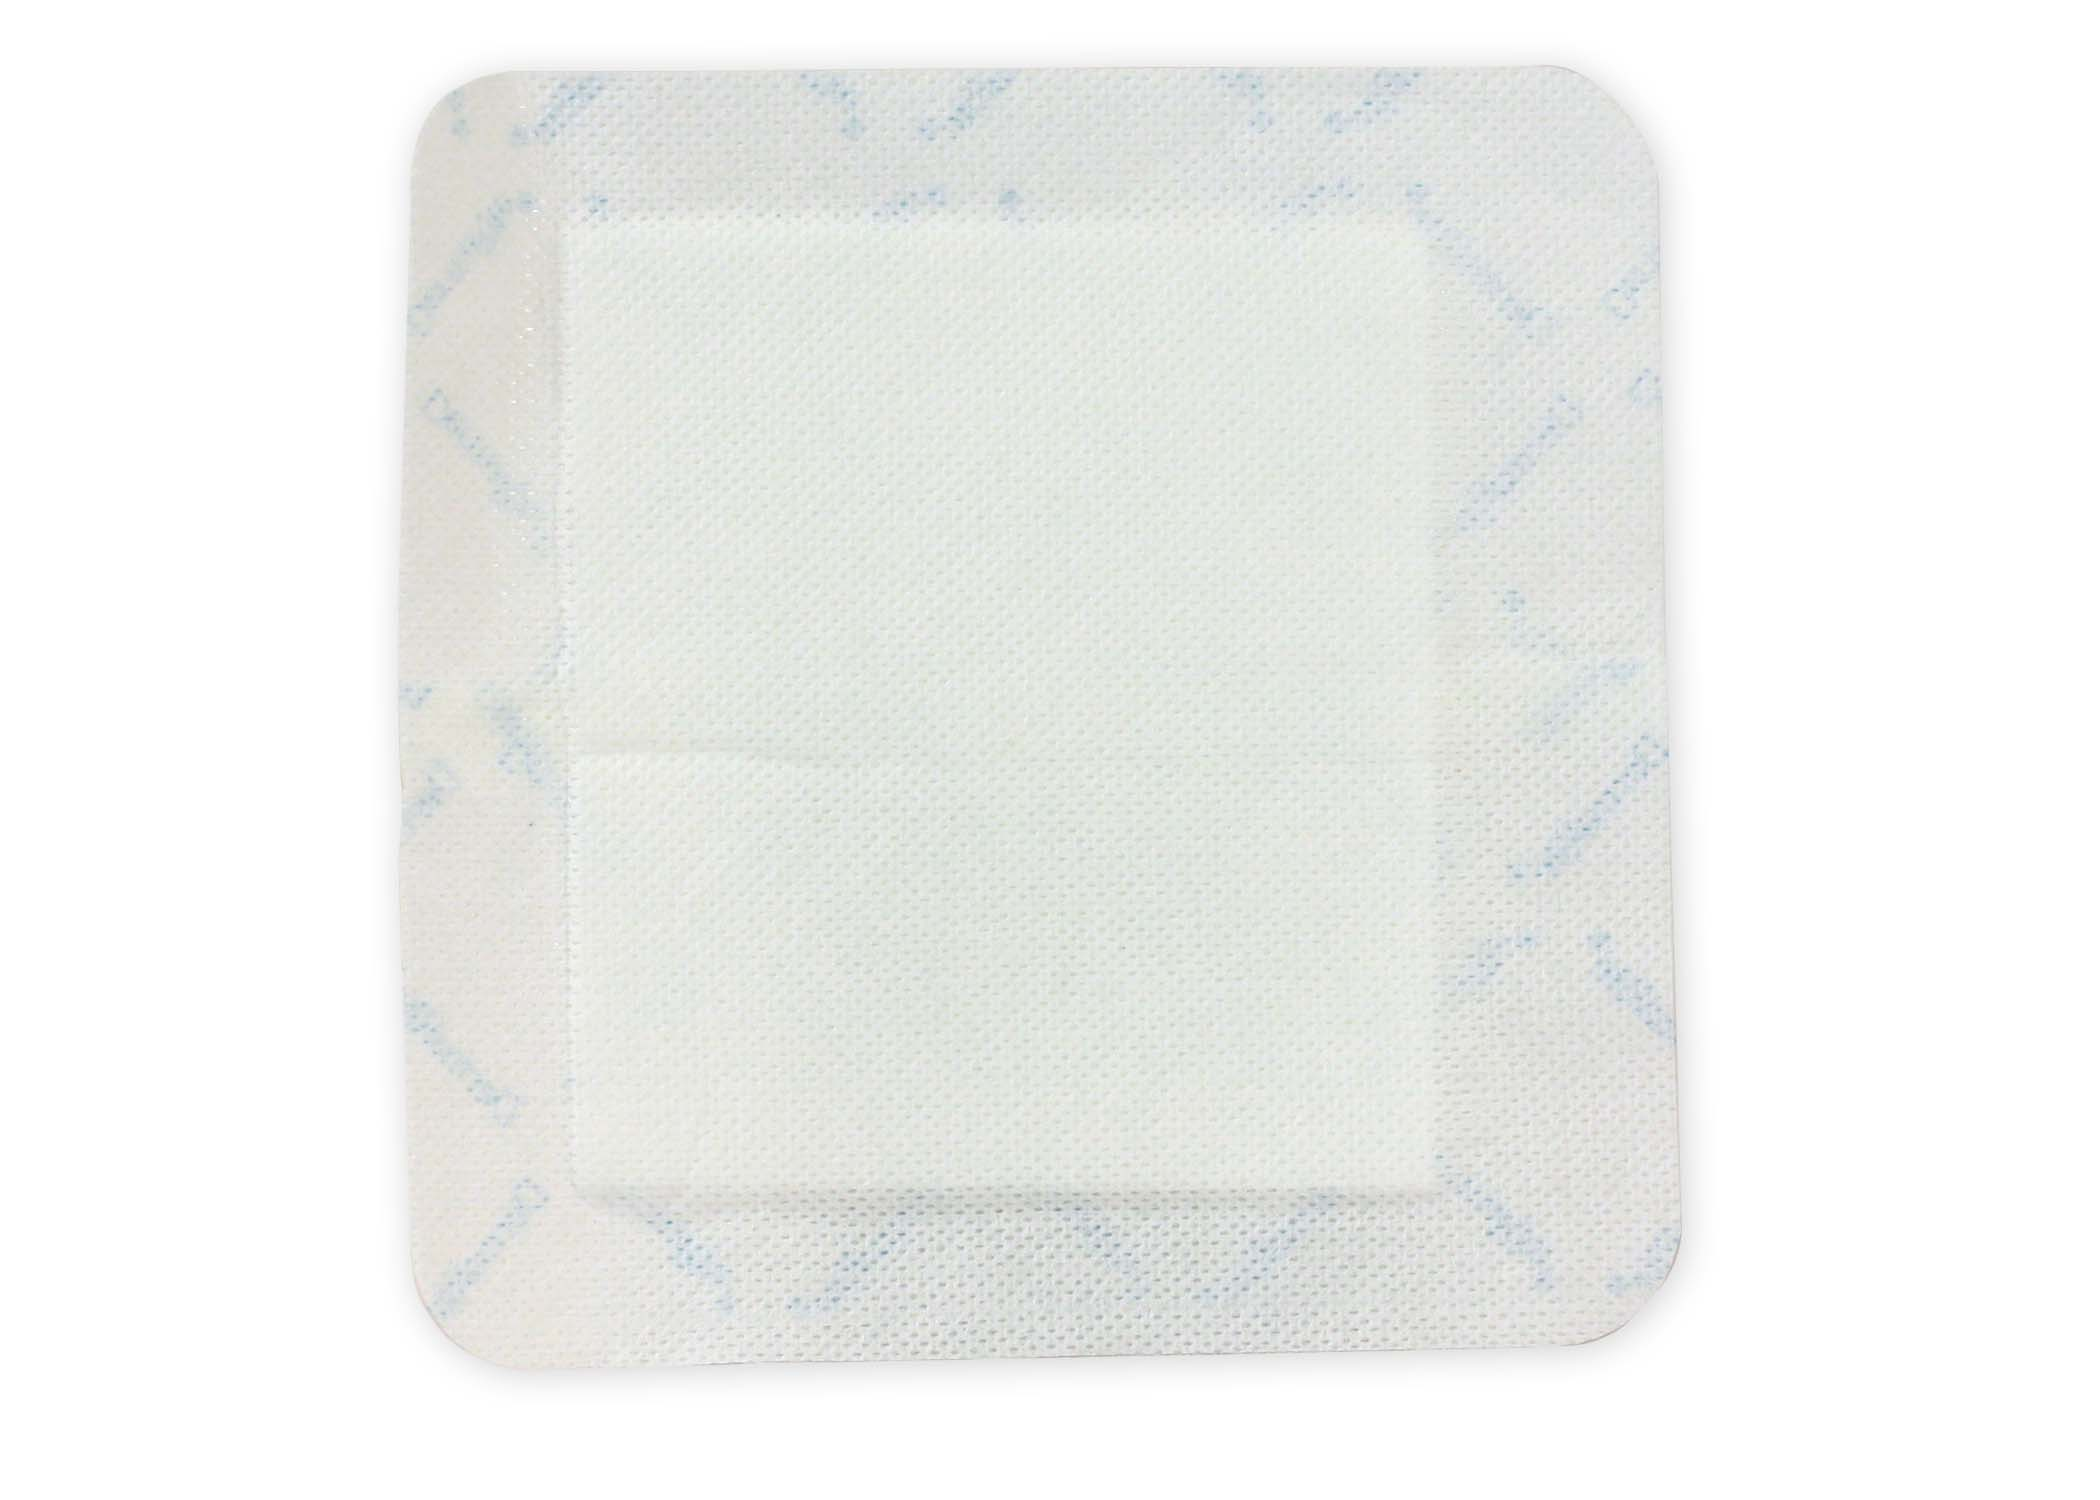 bordered gauze absorptive three layered soft flexible dressing